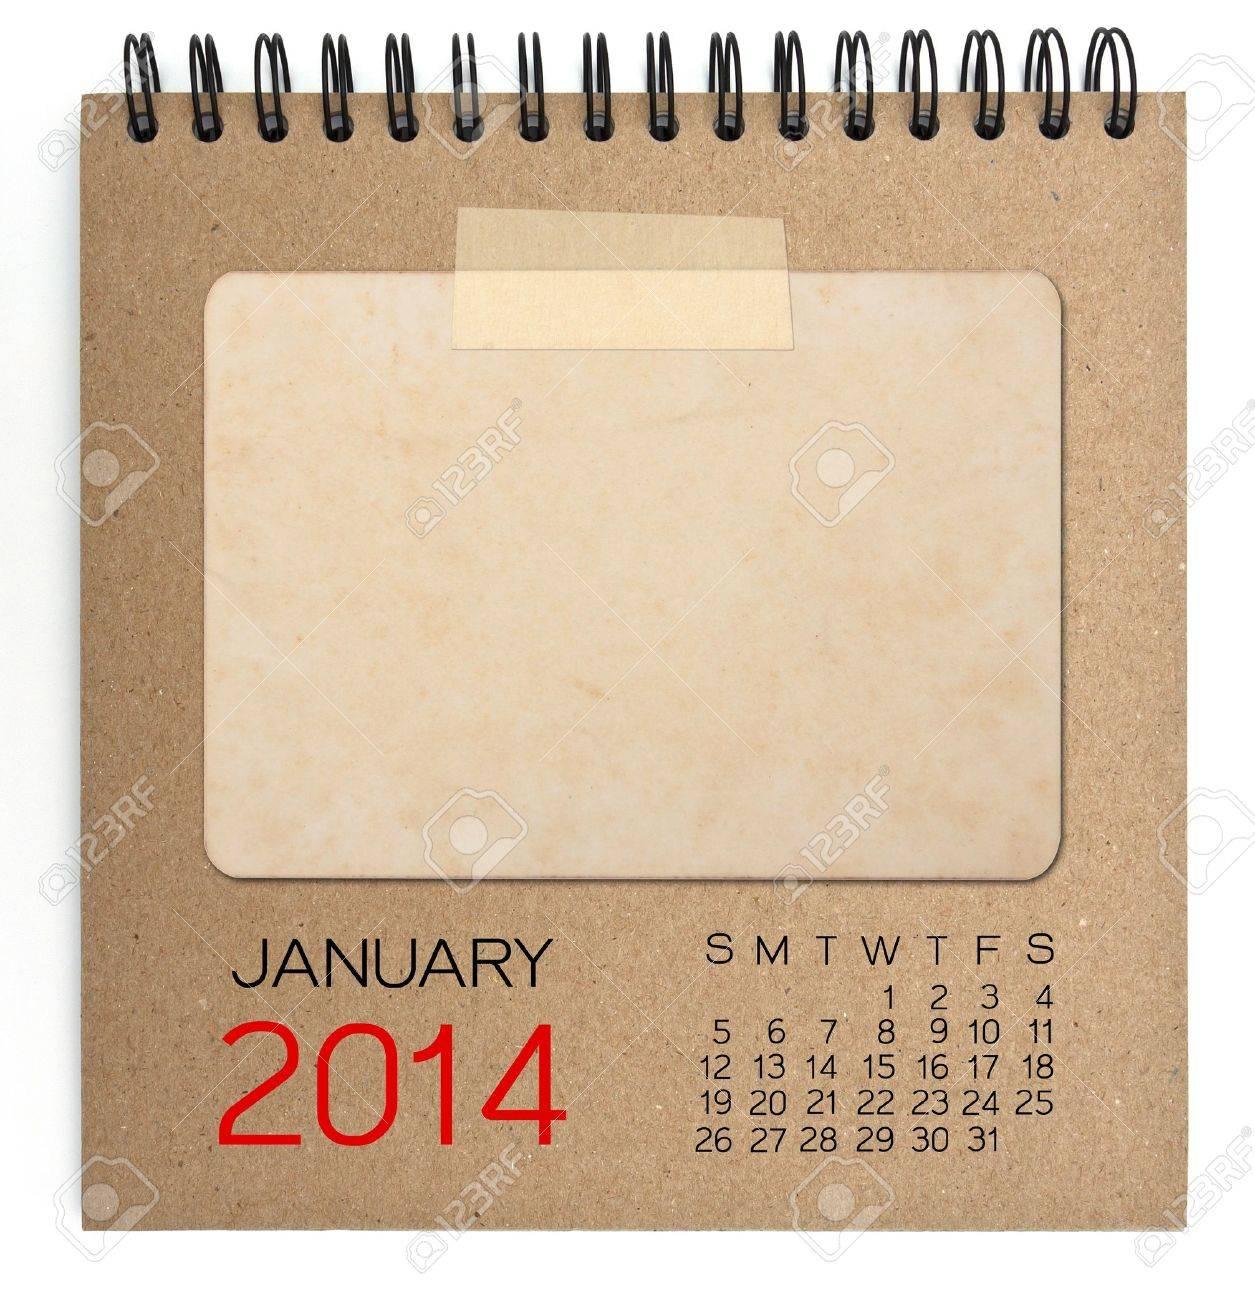 Calendrier 2014 cahier brun Banque d'images - 20822516